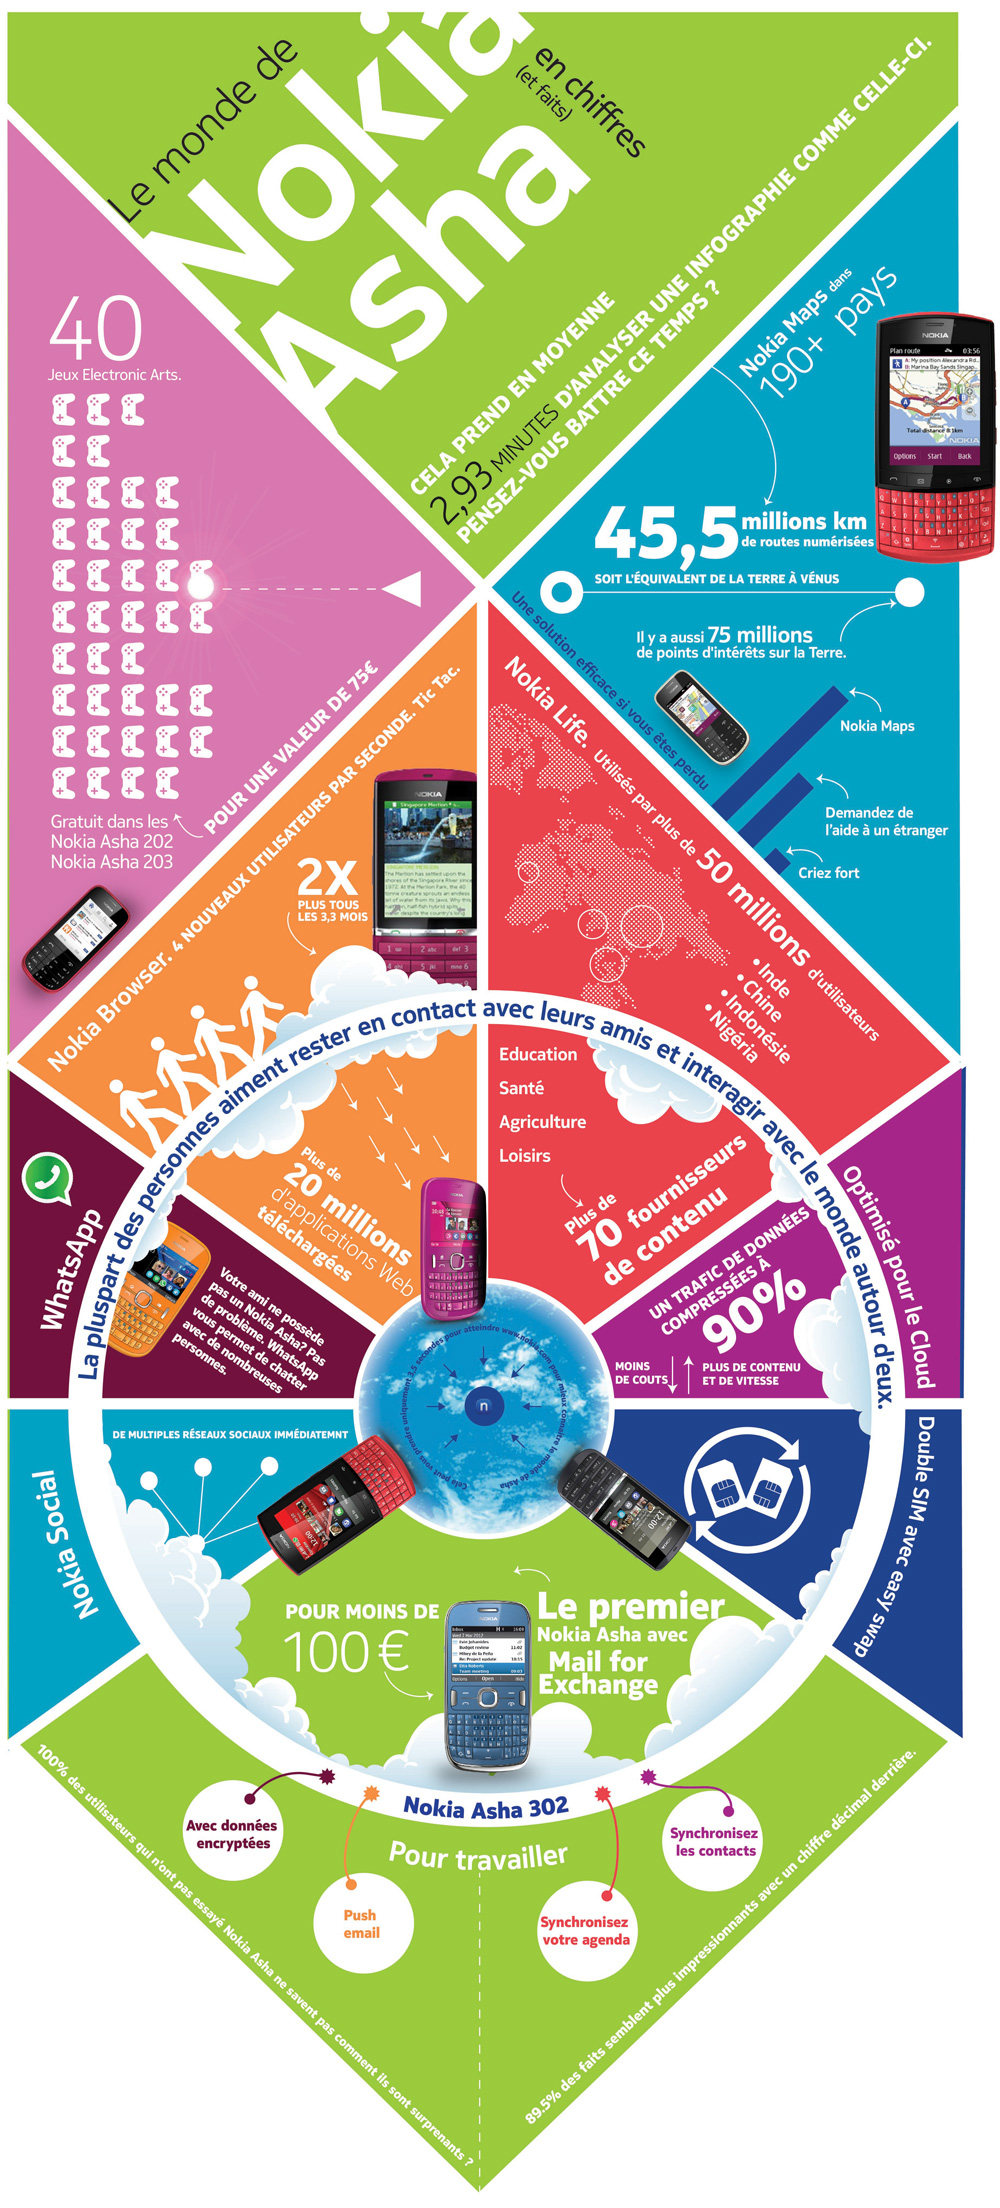 Infographie : le monde de Nokia Asha